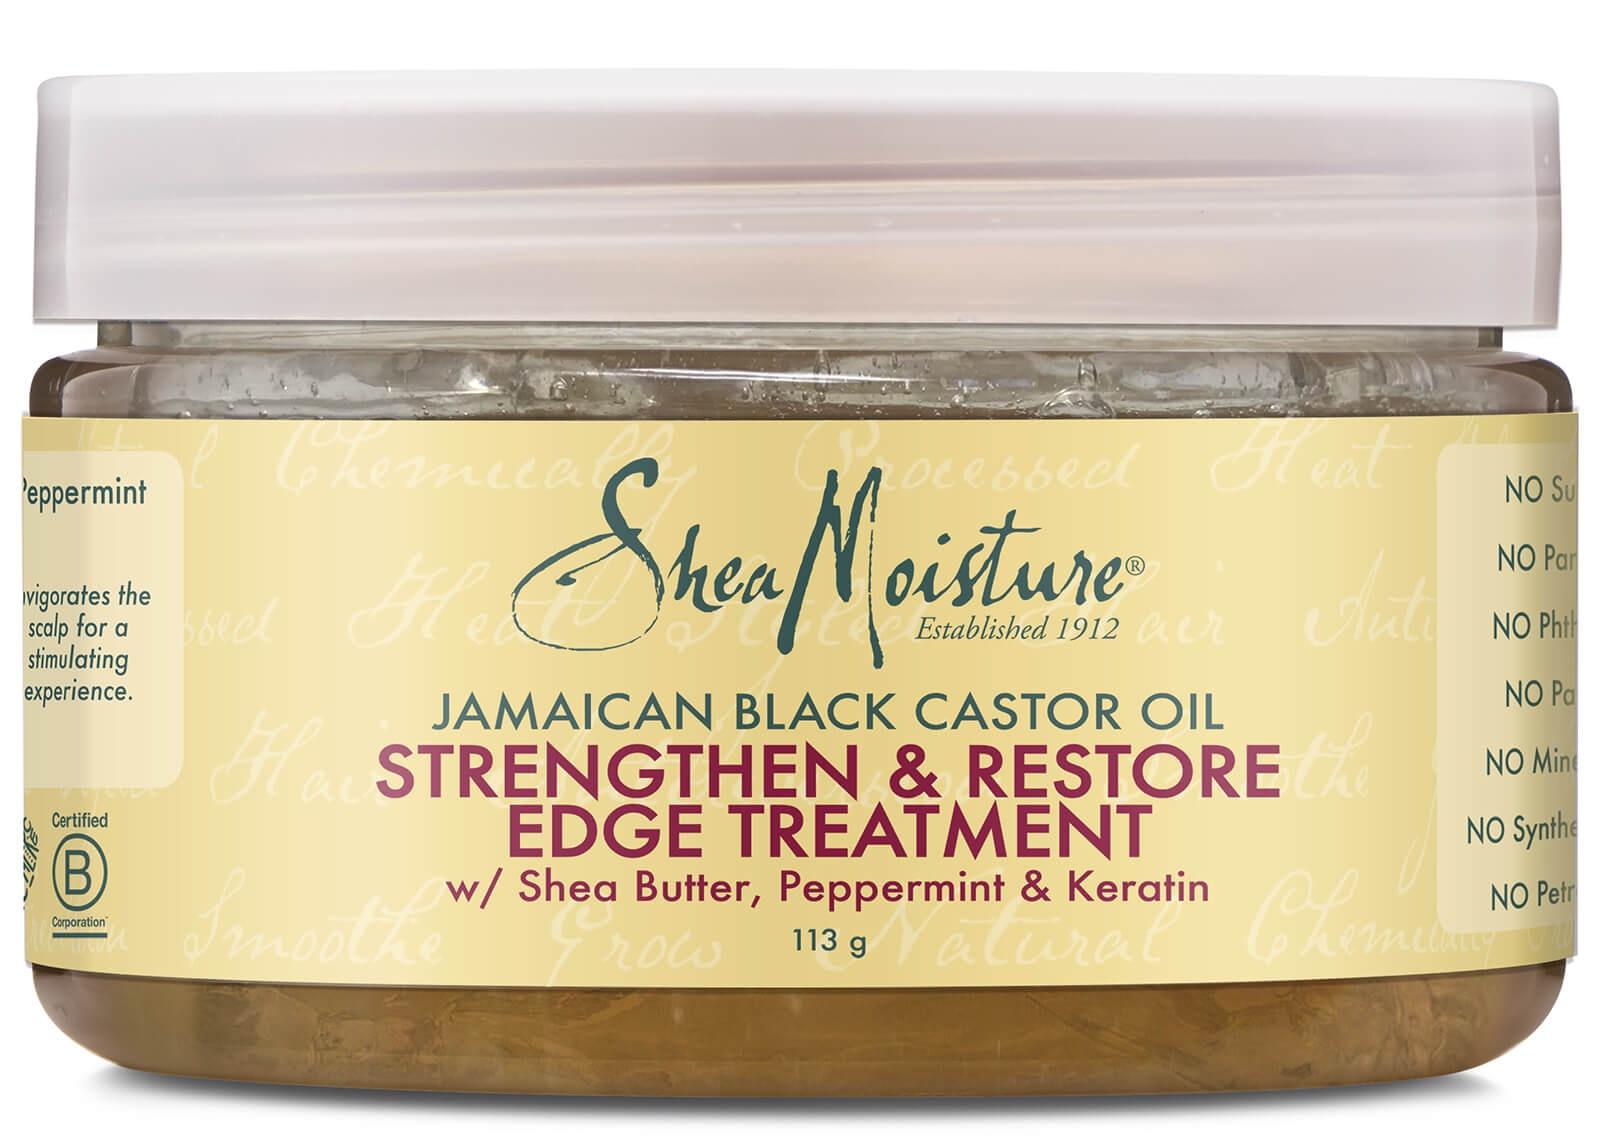 Shea Moisture Jamaican Black Castor Oil Strengthen, Grow & Repair Edge Treatment